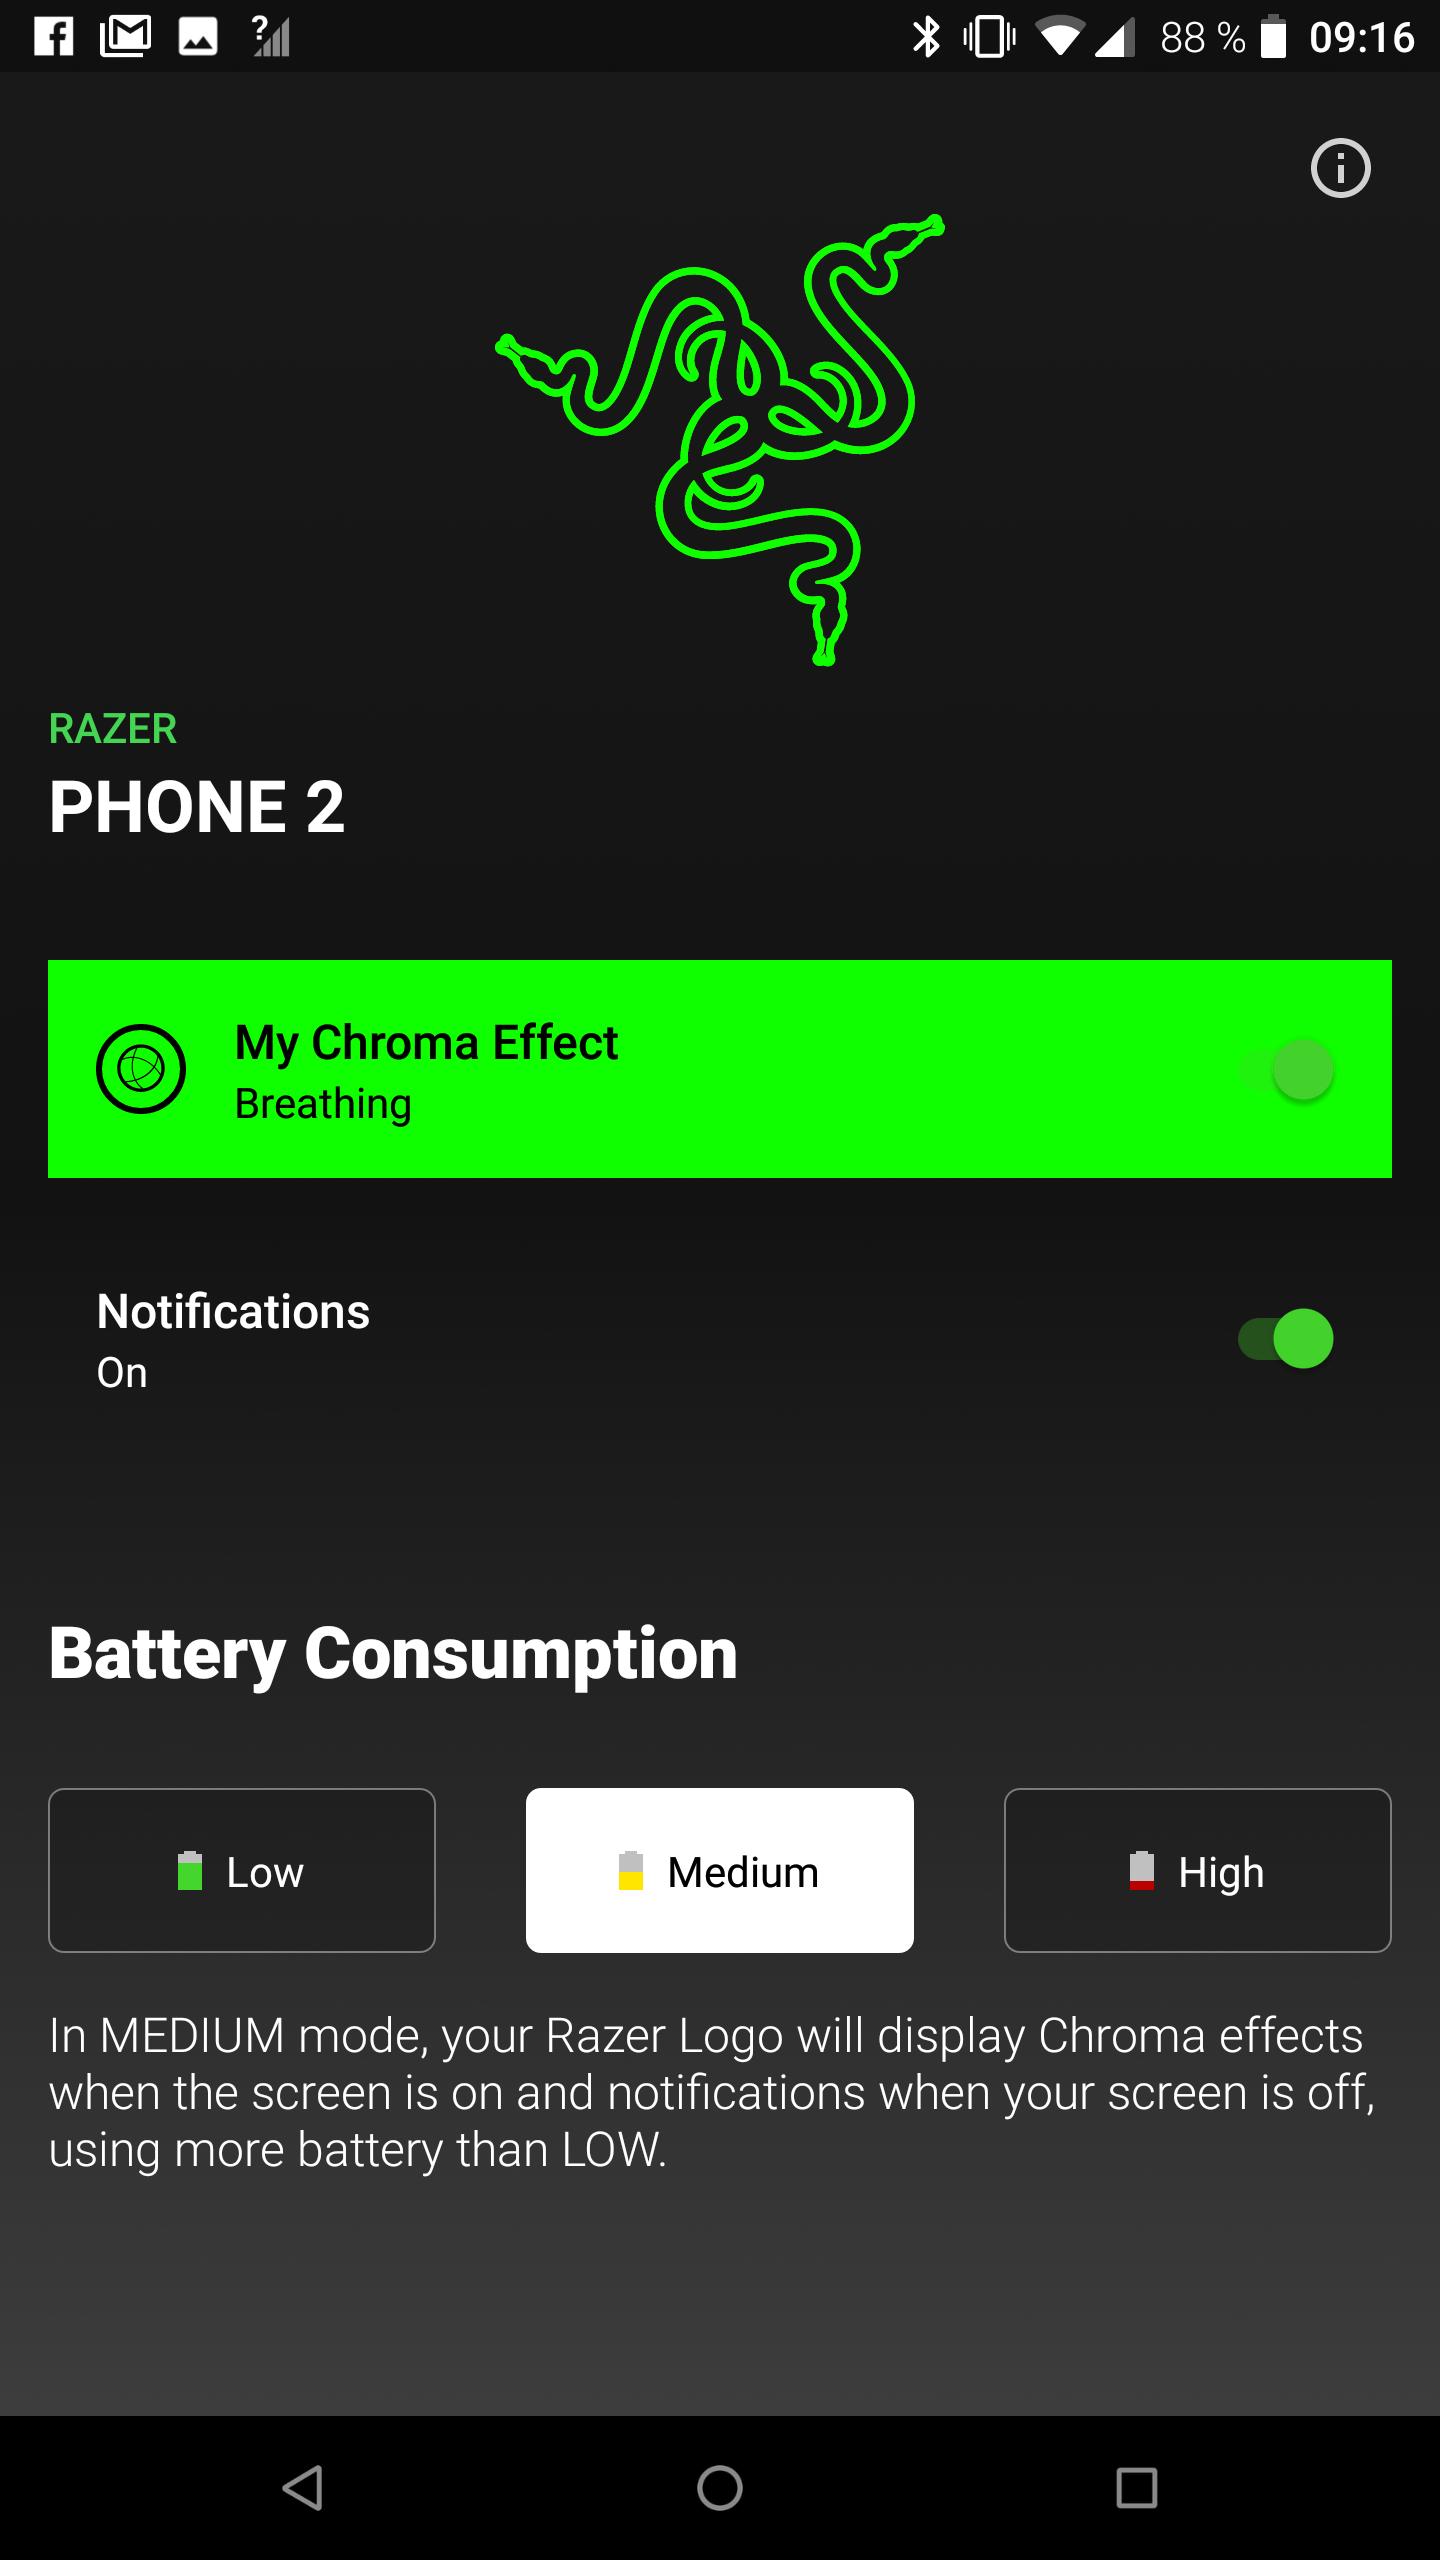 Das ChromaKit des Razer Phone 2